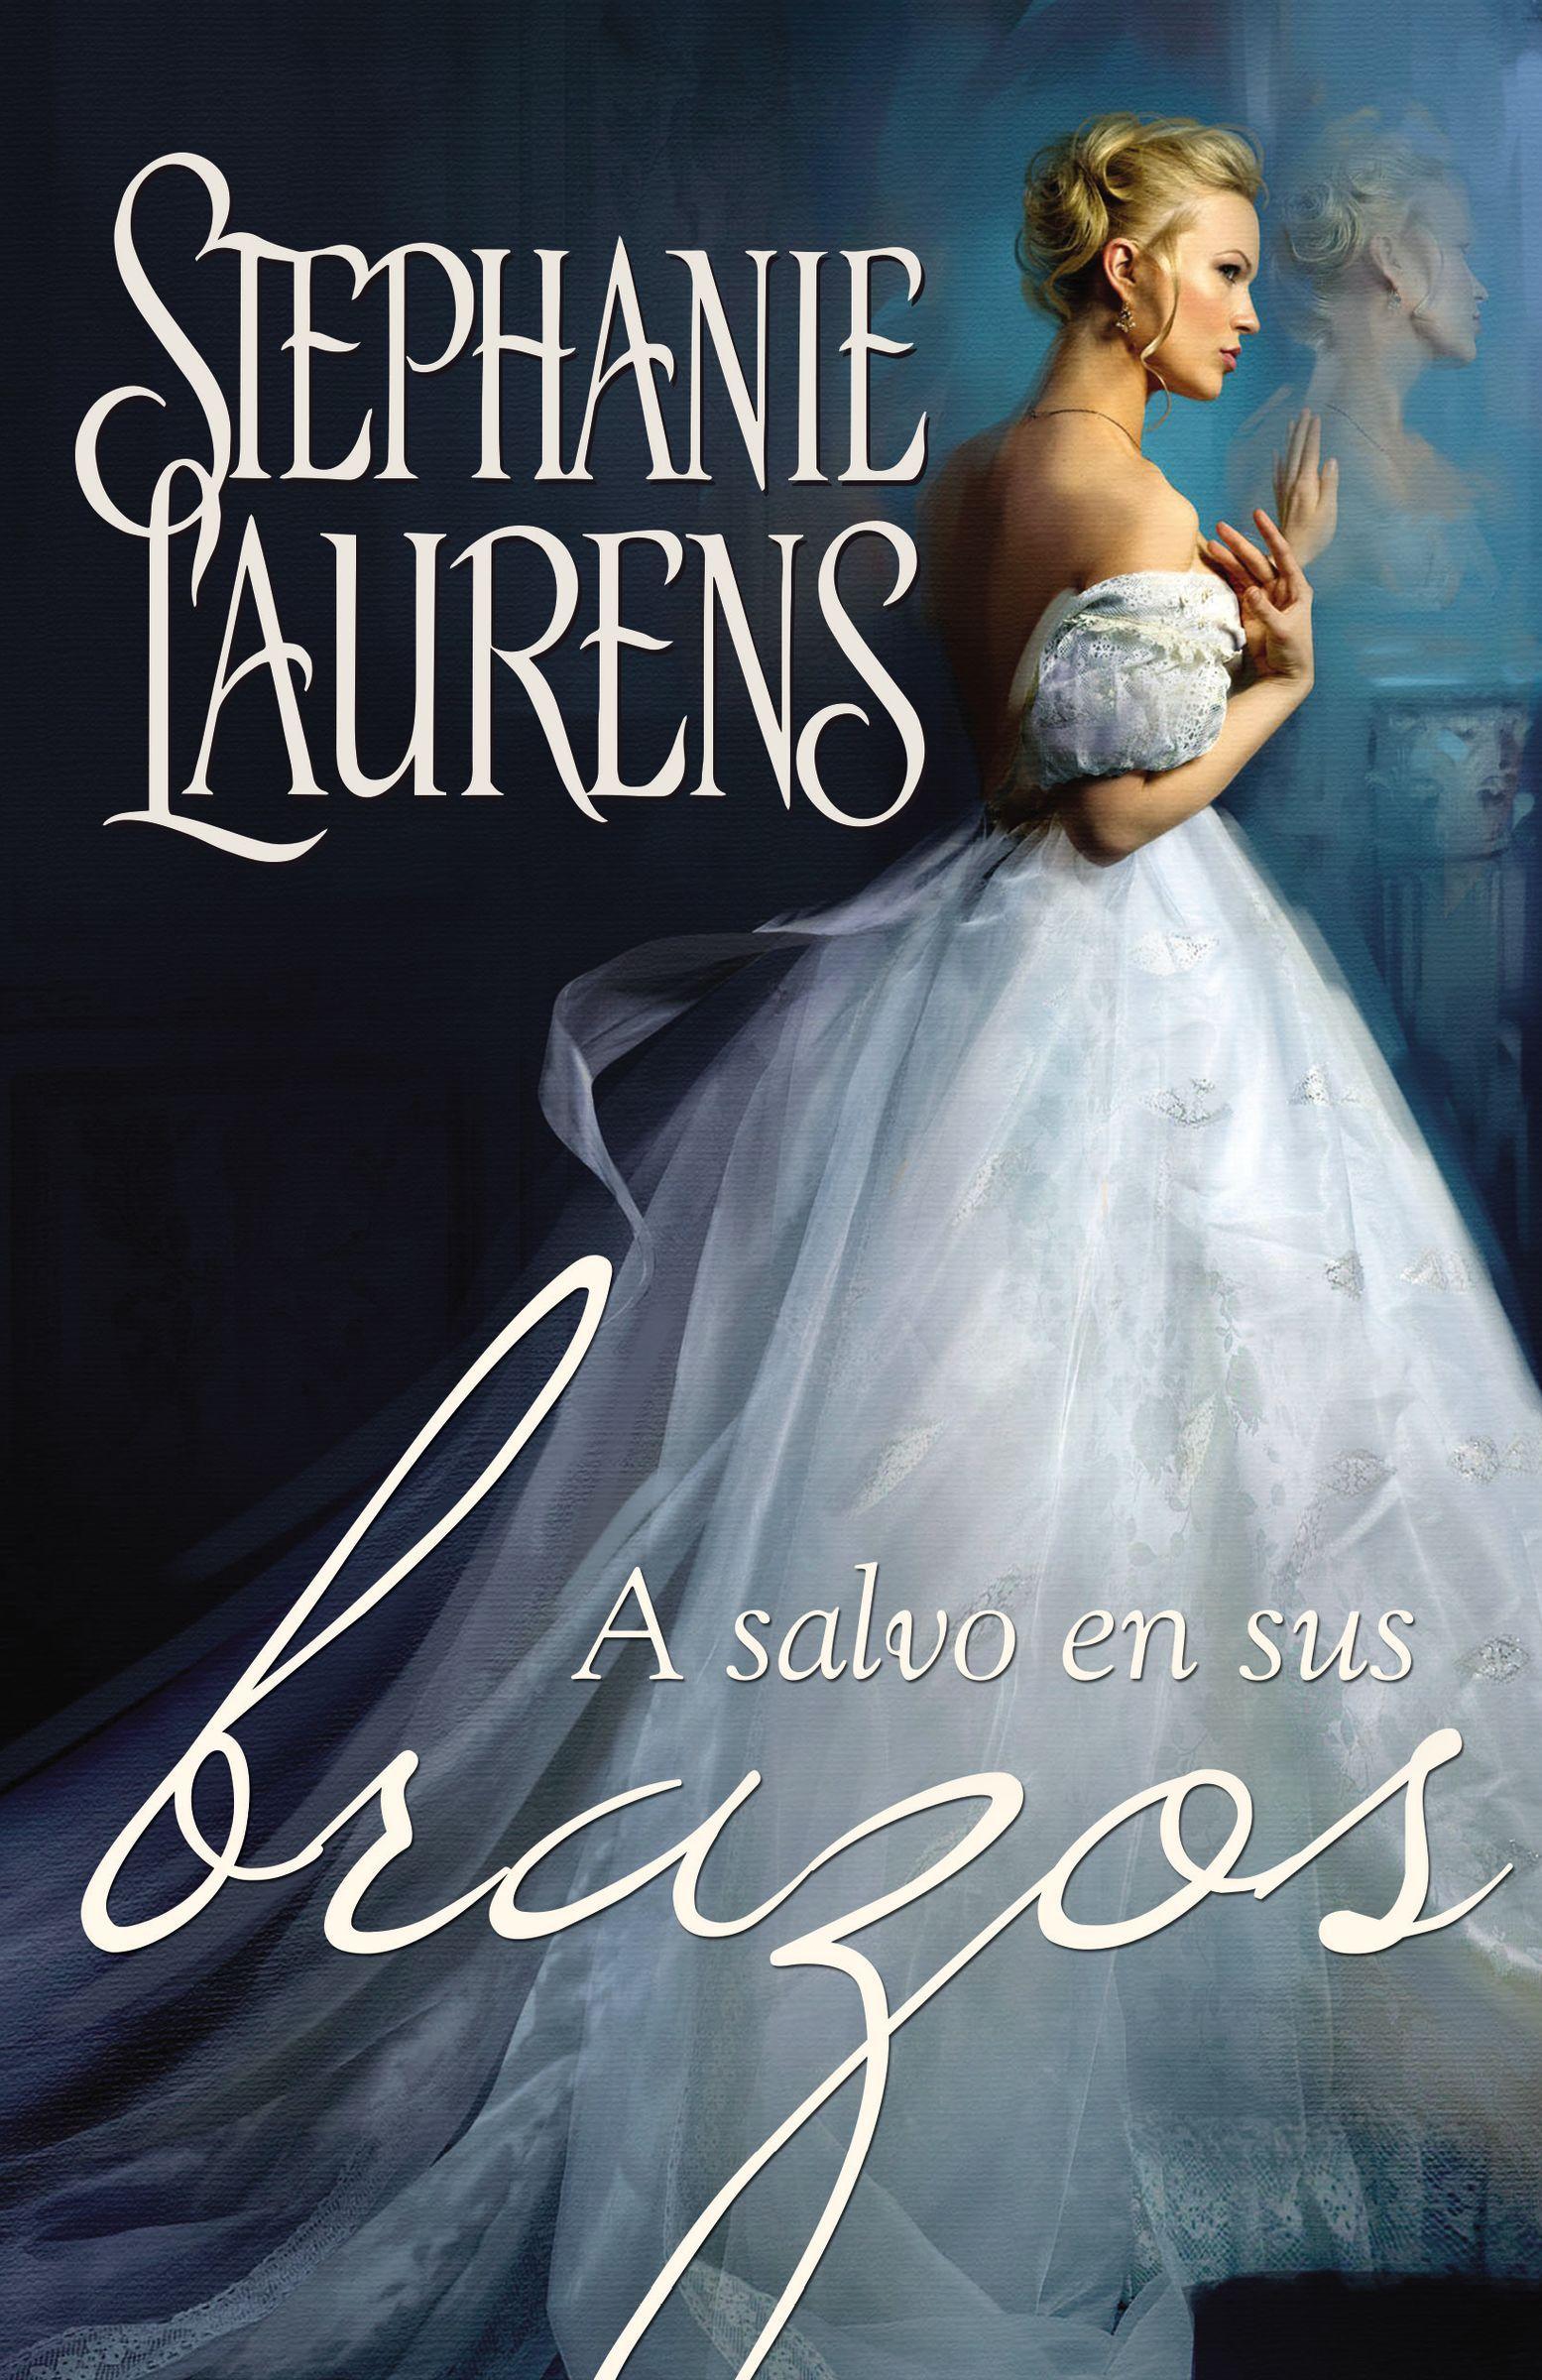 A salvo en sus brazos  by  Stephanie Laurens